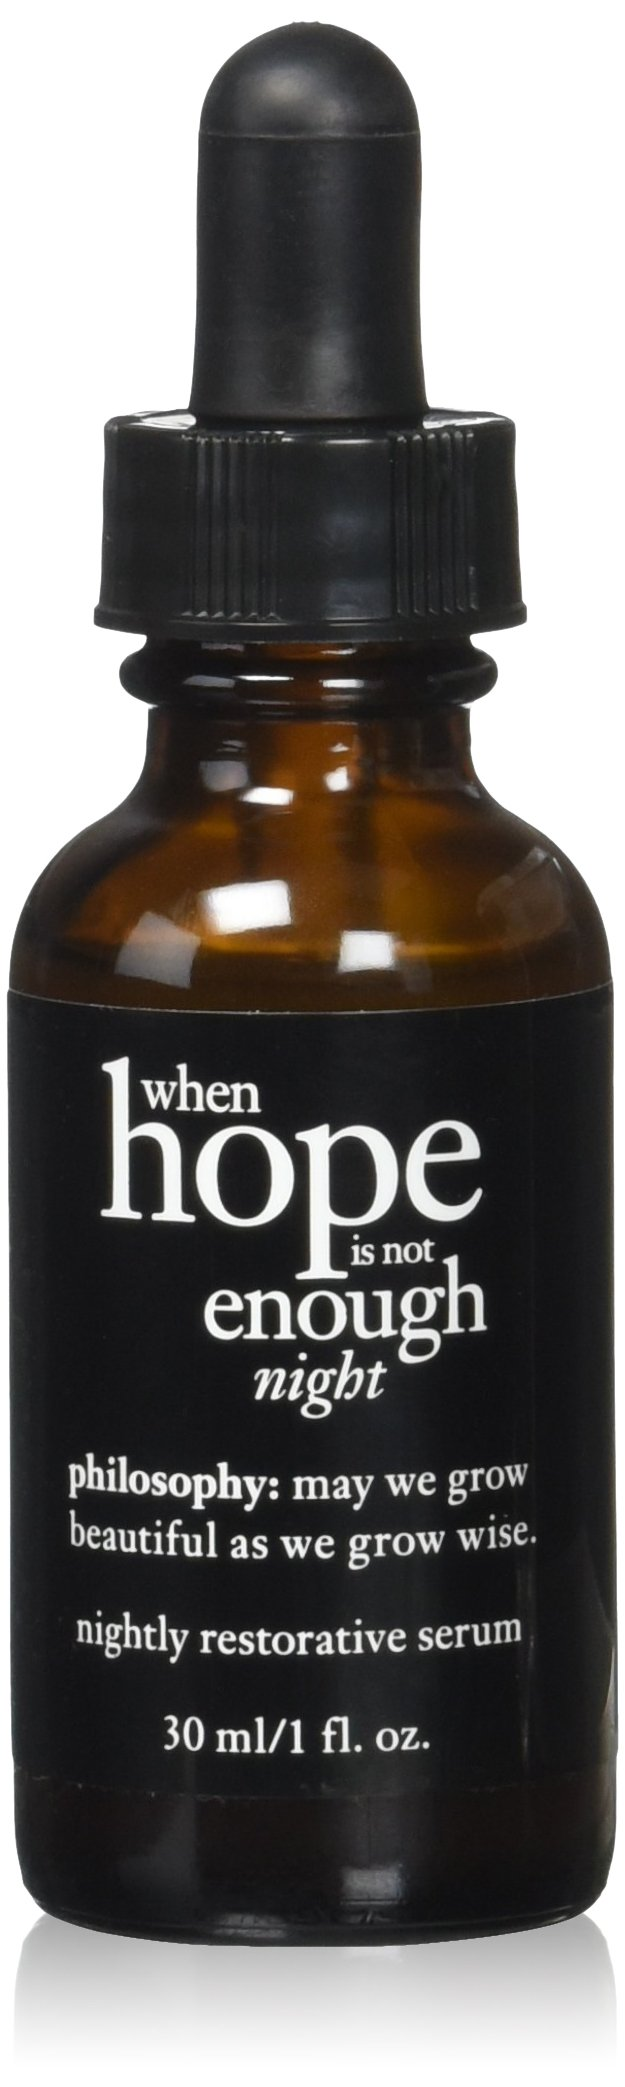 Philosophy - When Hope is not Enough Nightly Restorative Serum